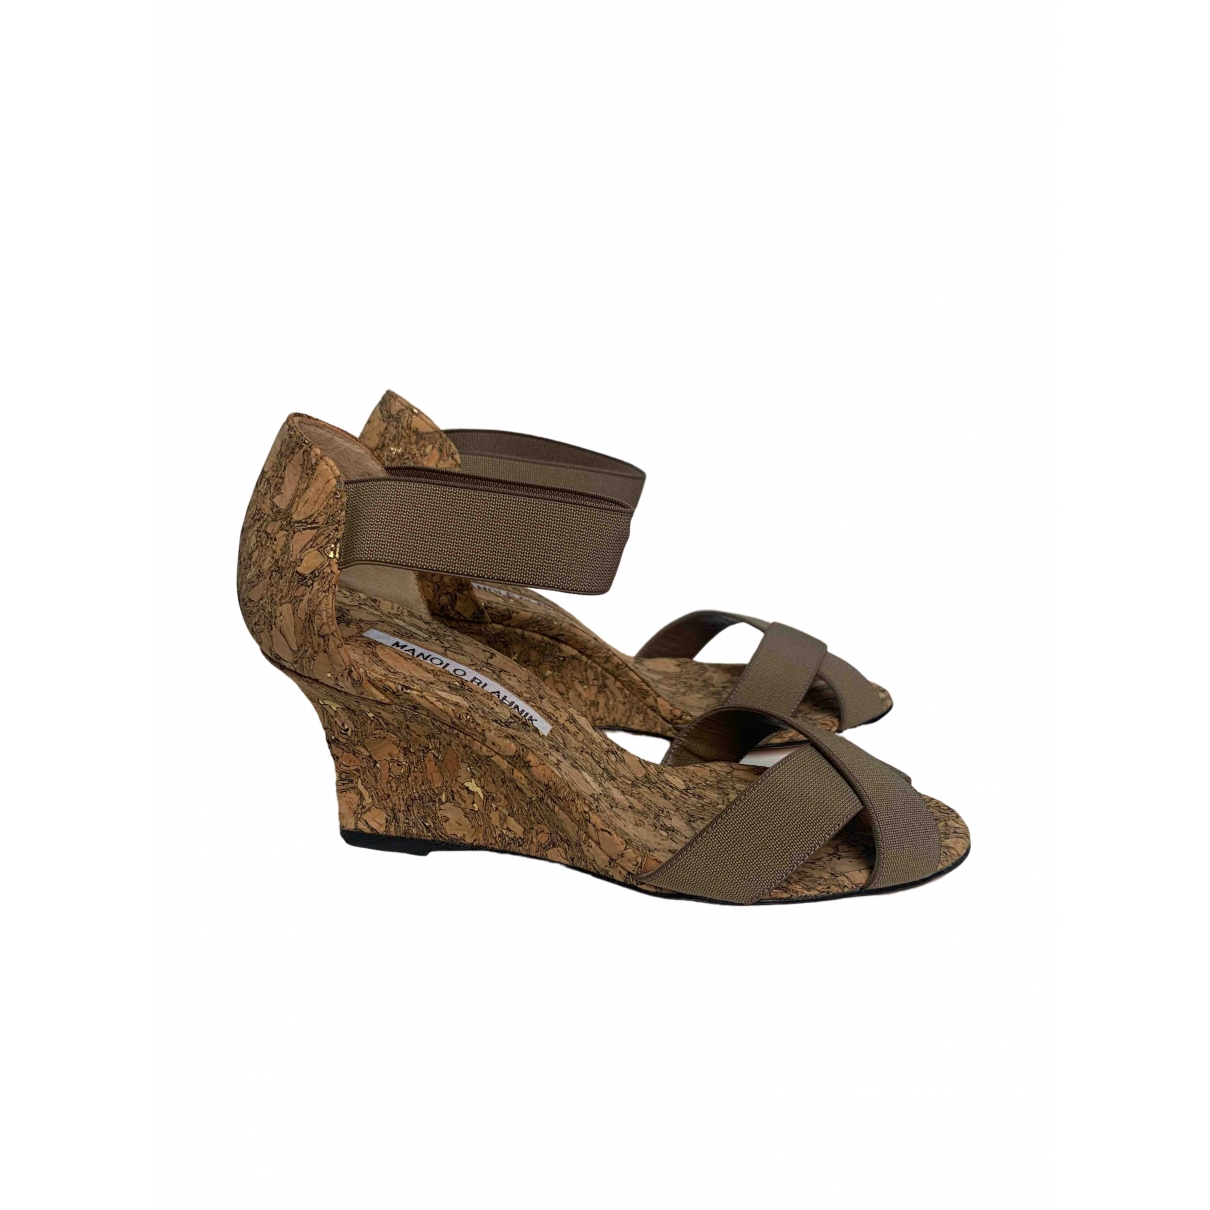 Manolo Blahnik \N Beige Cloth Sandals for Women 36 EU